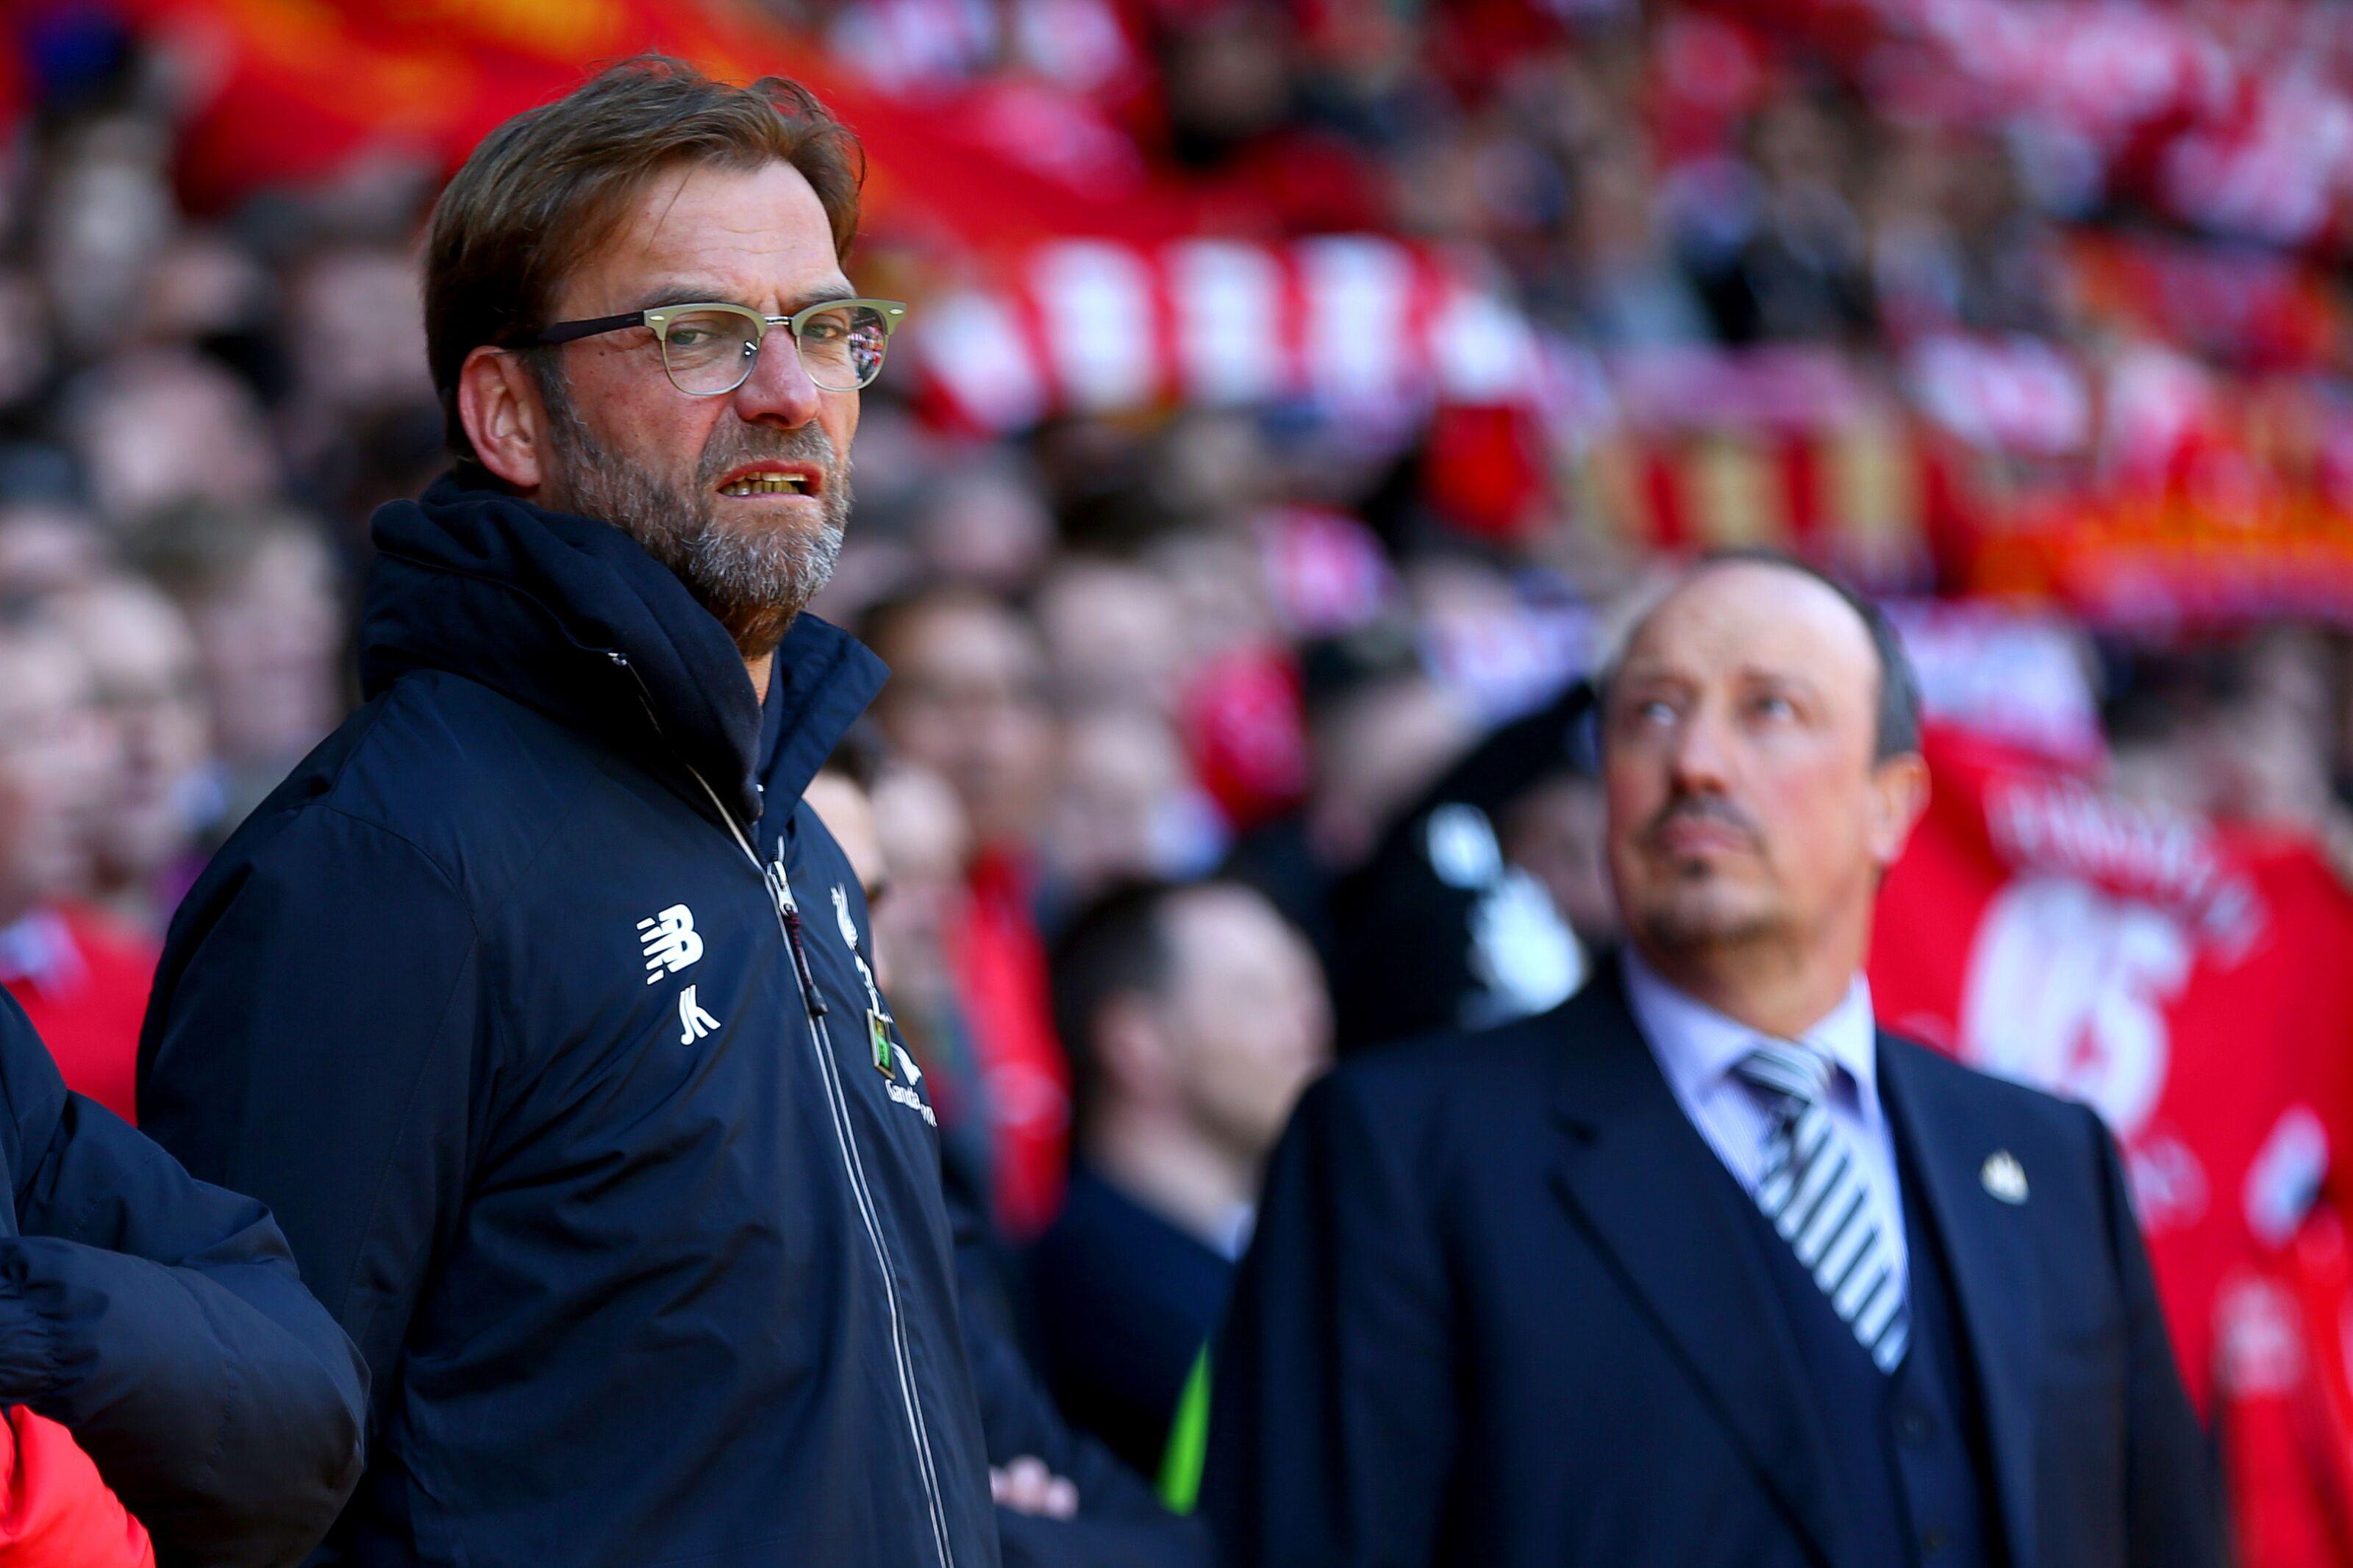 Liverpool: Jurgen Klopp equals Rafa Benitez record with award